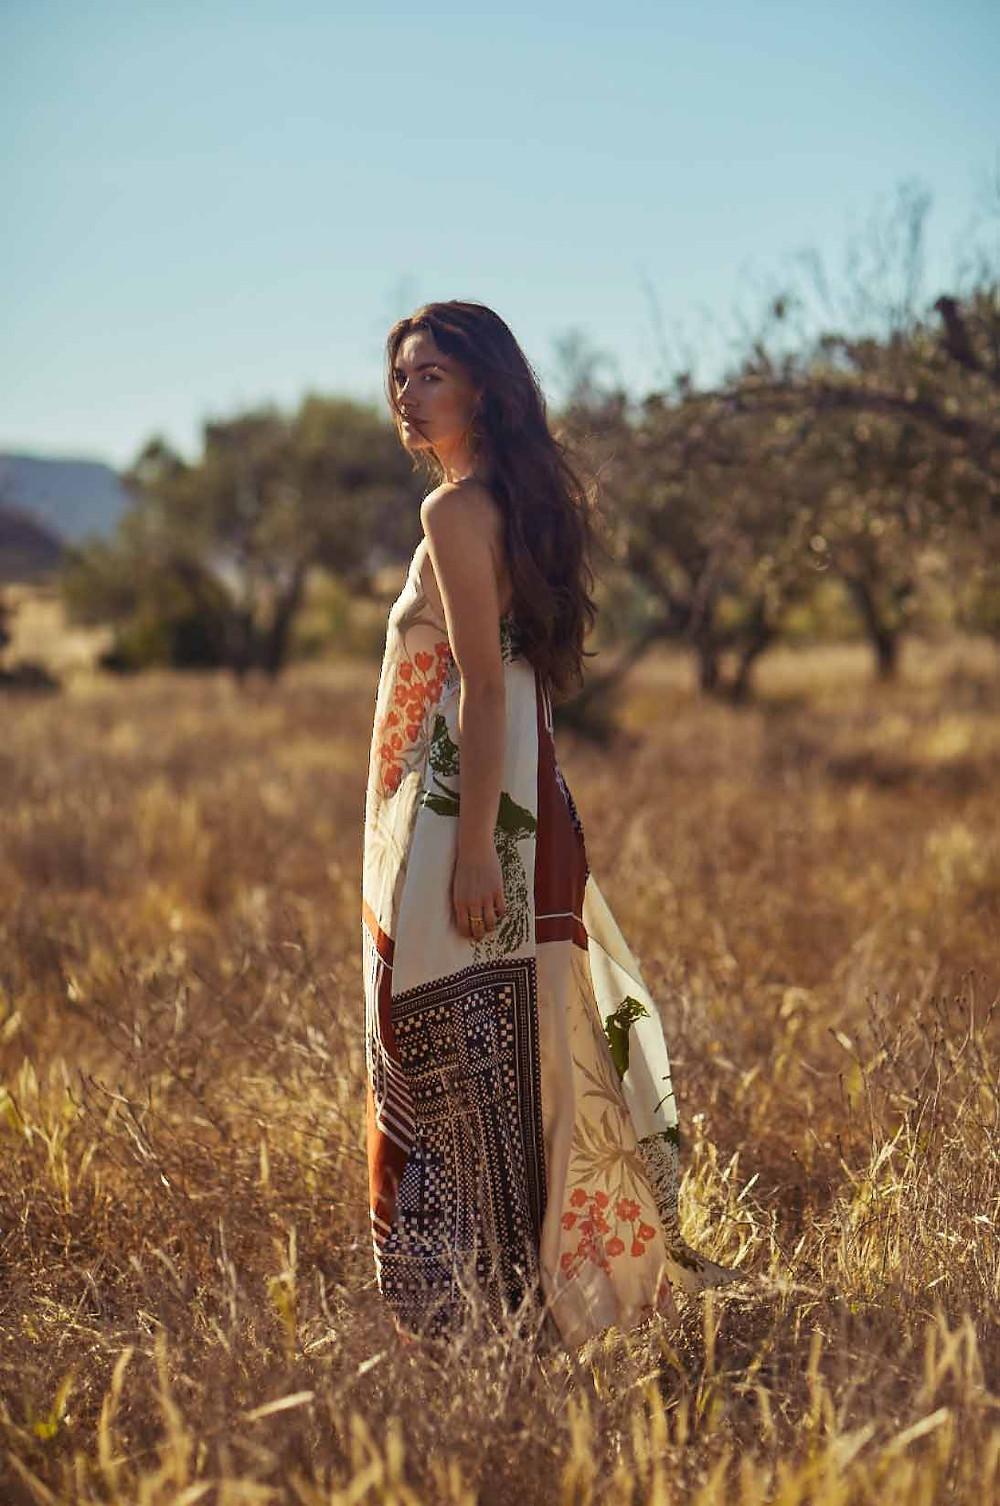 Anna in #15 Slip Dress